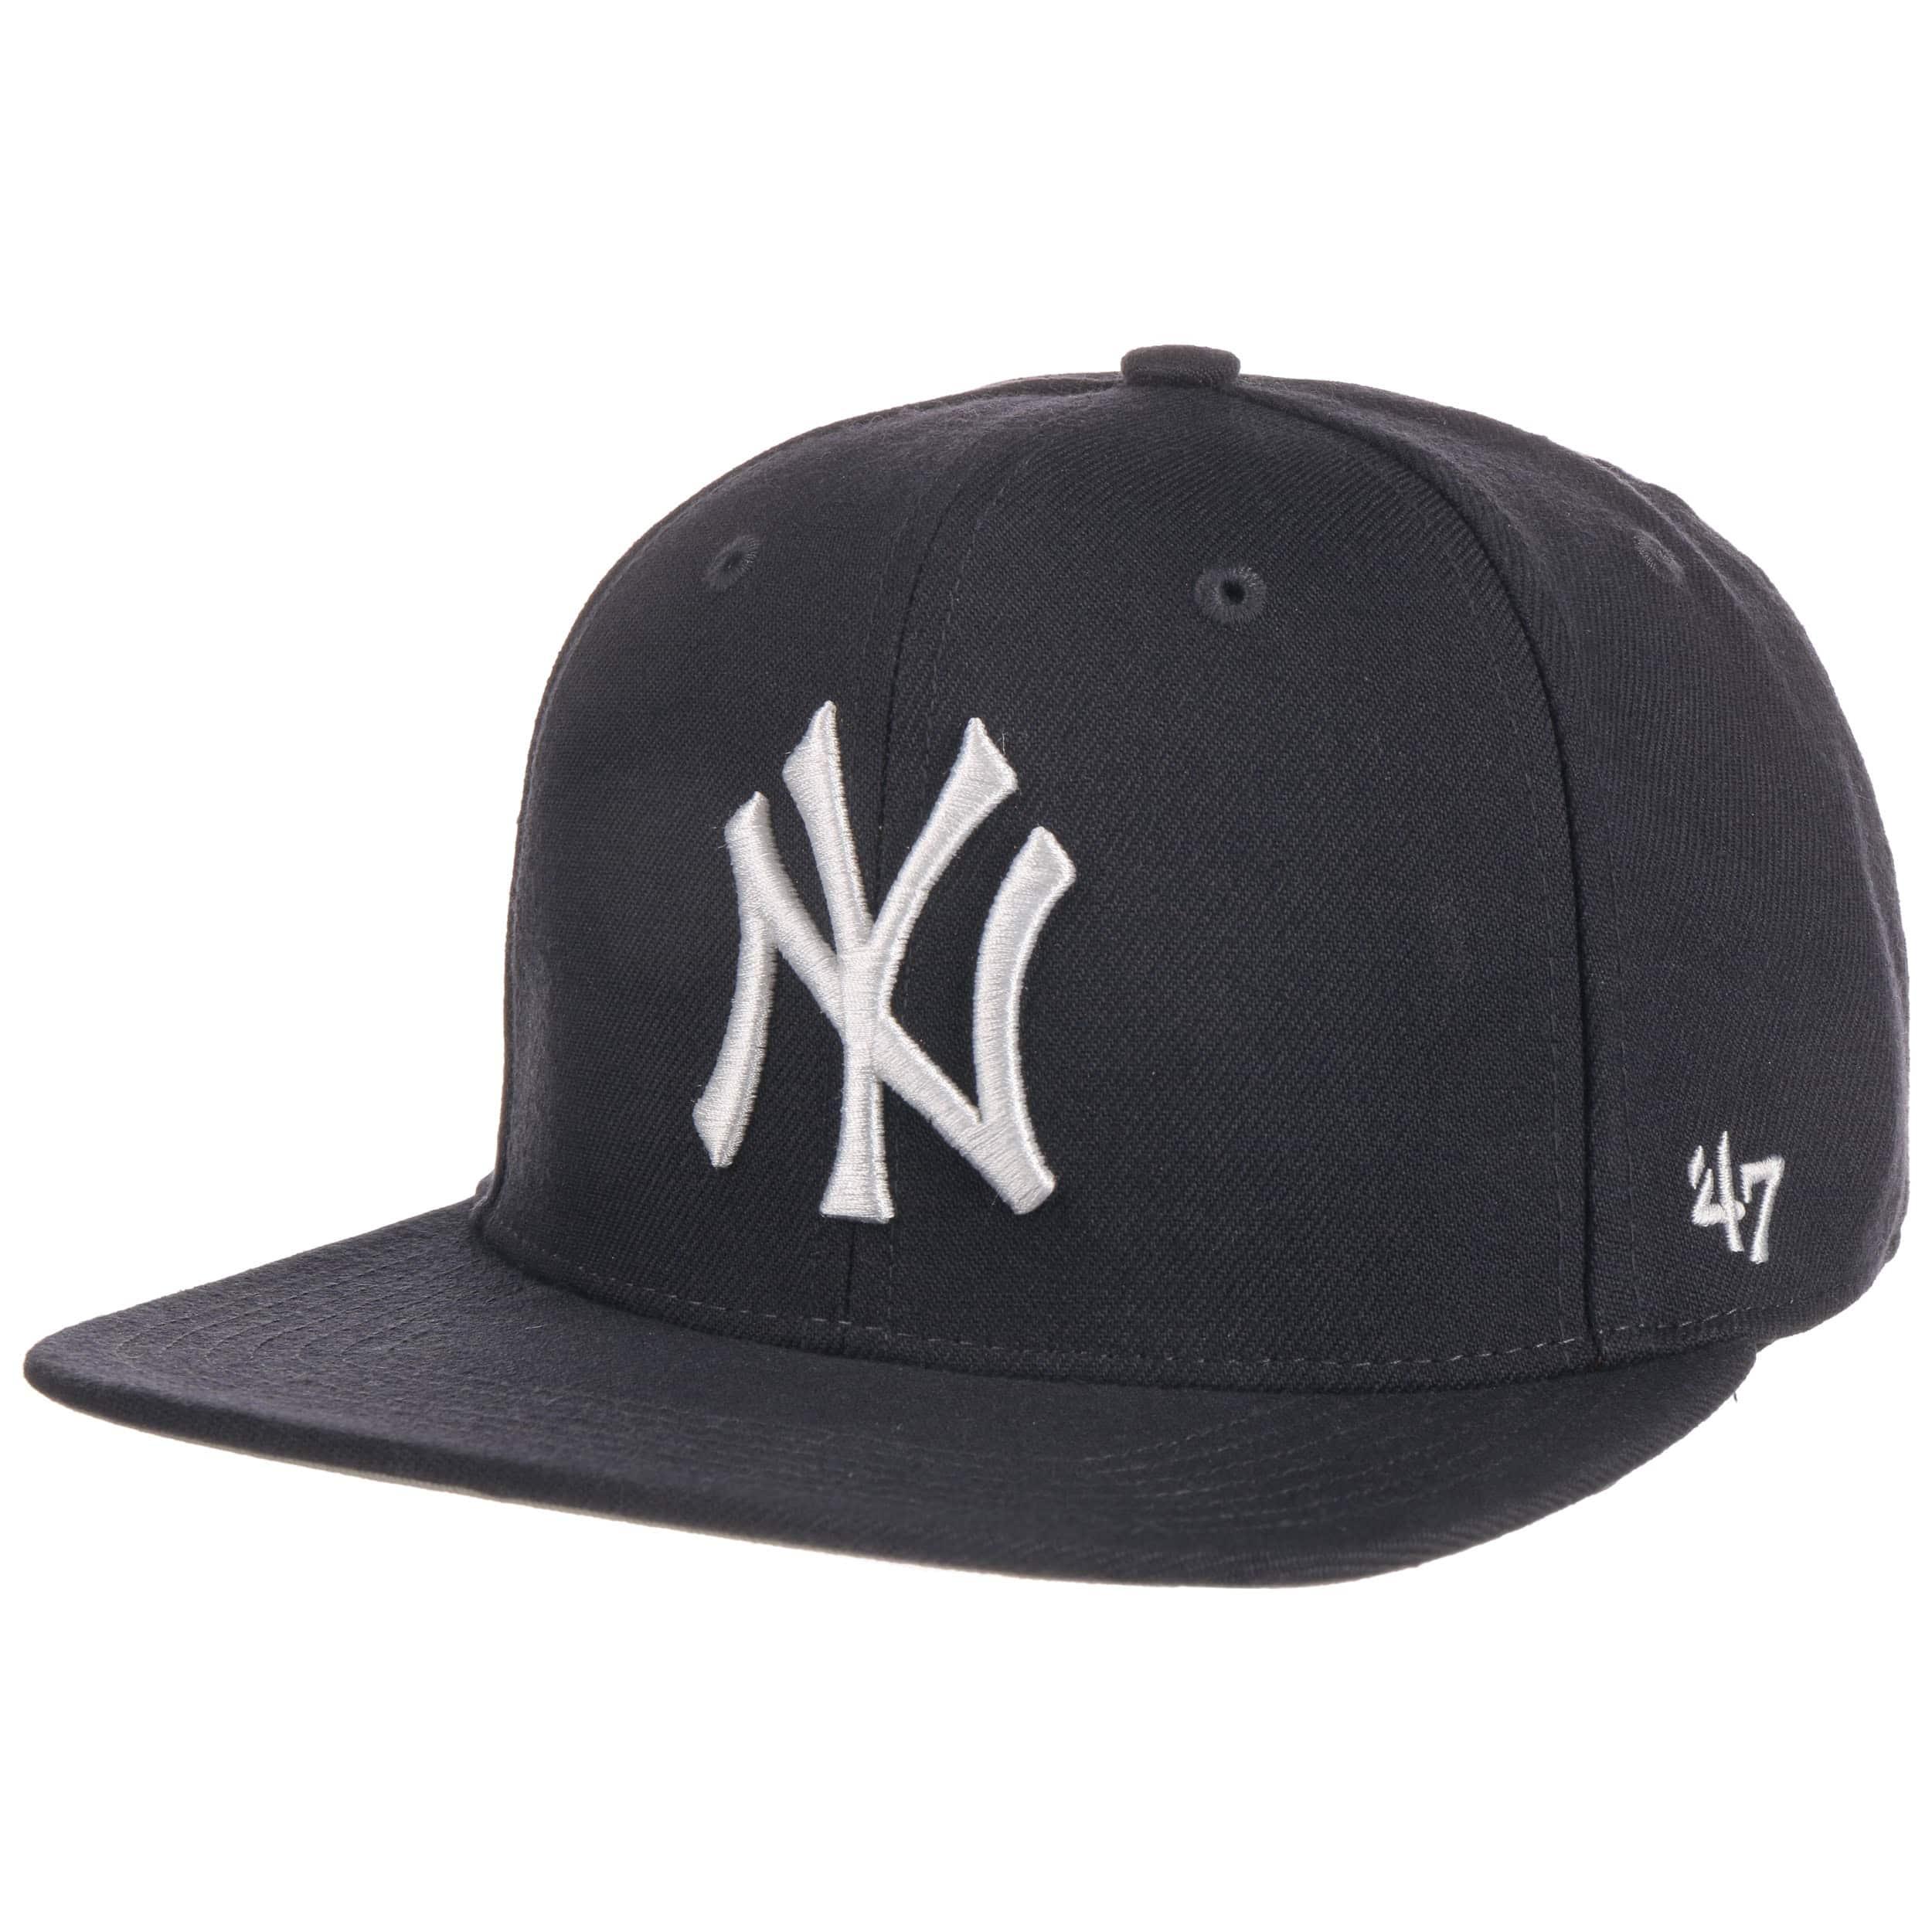 fcf594550dea Gorra Youth NoShot Yankees by 47 Brand